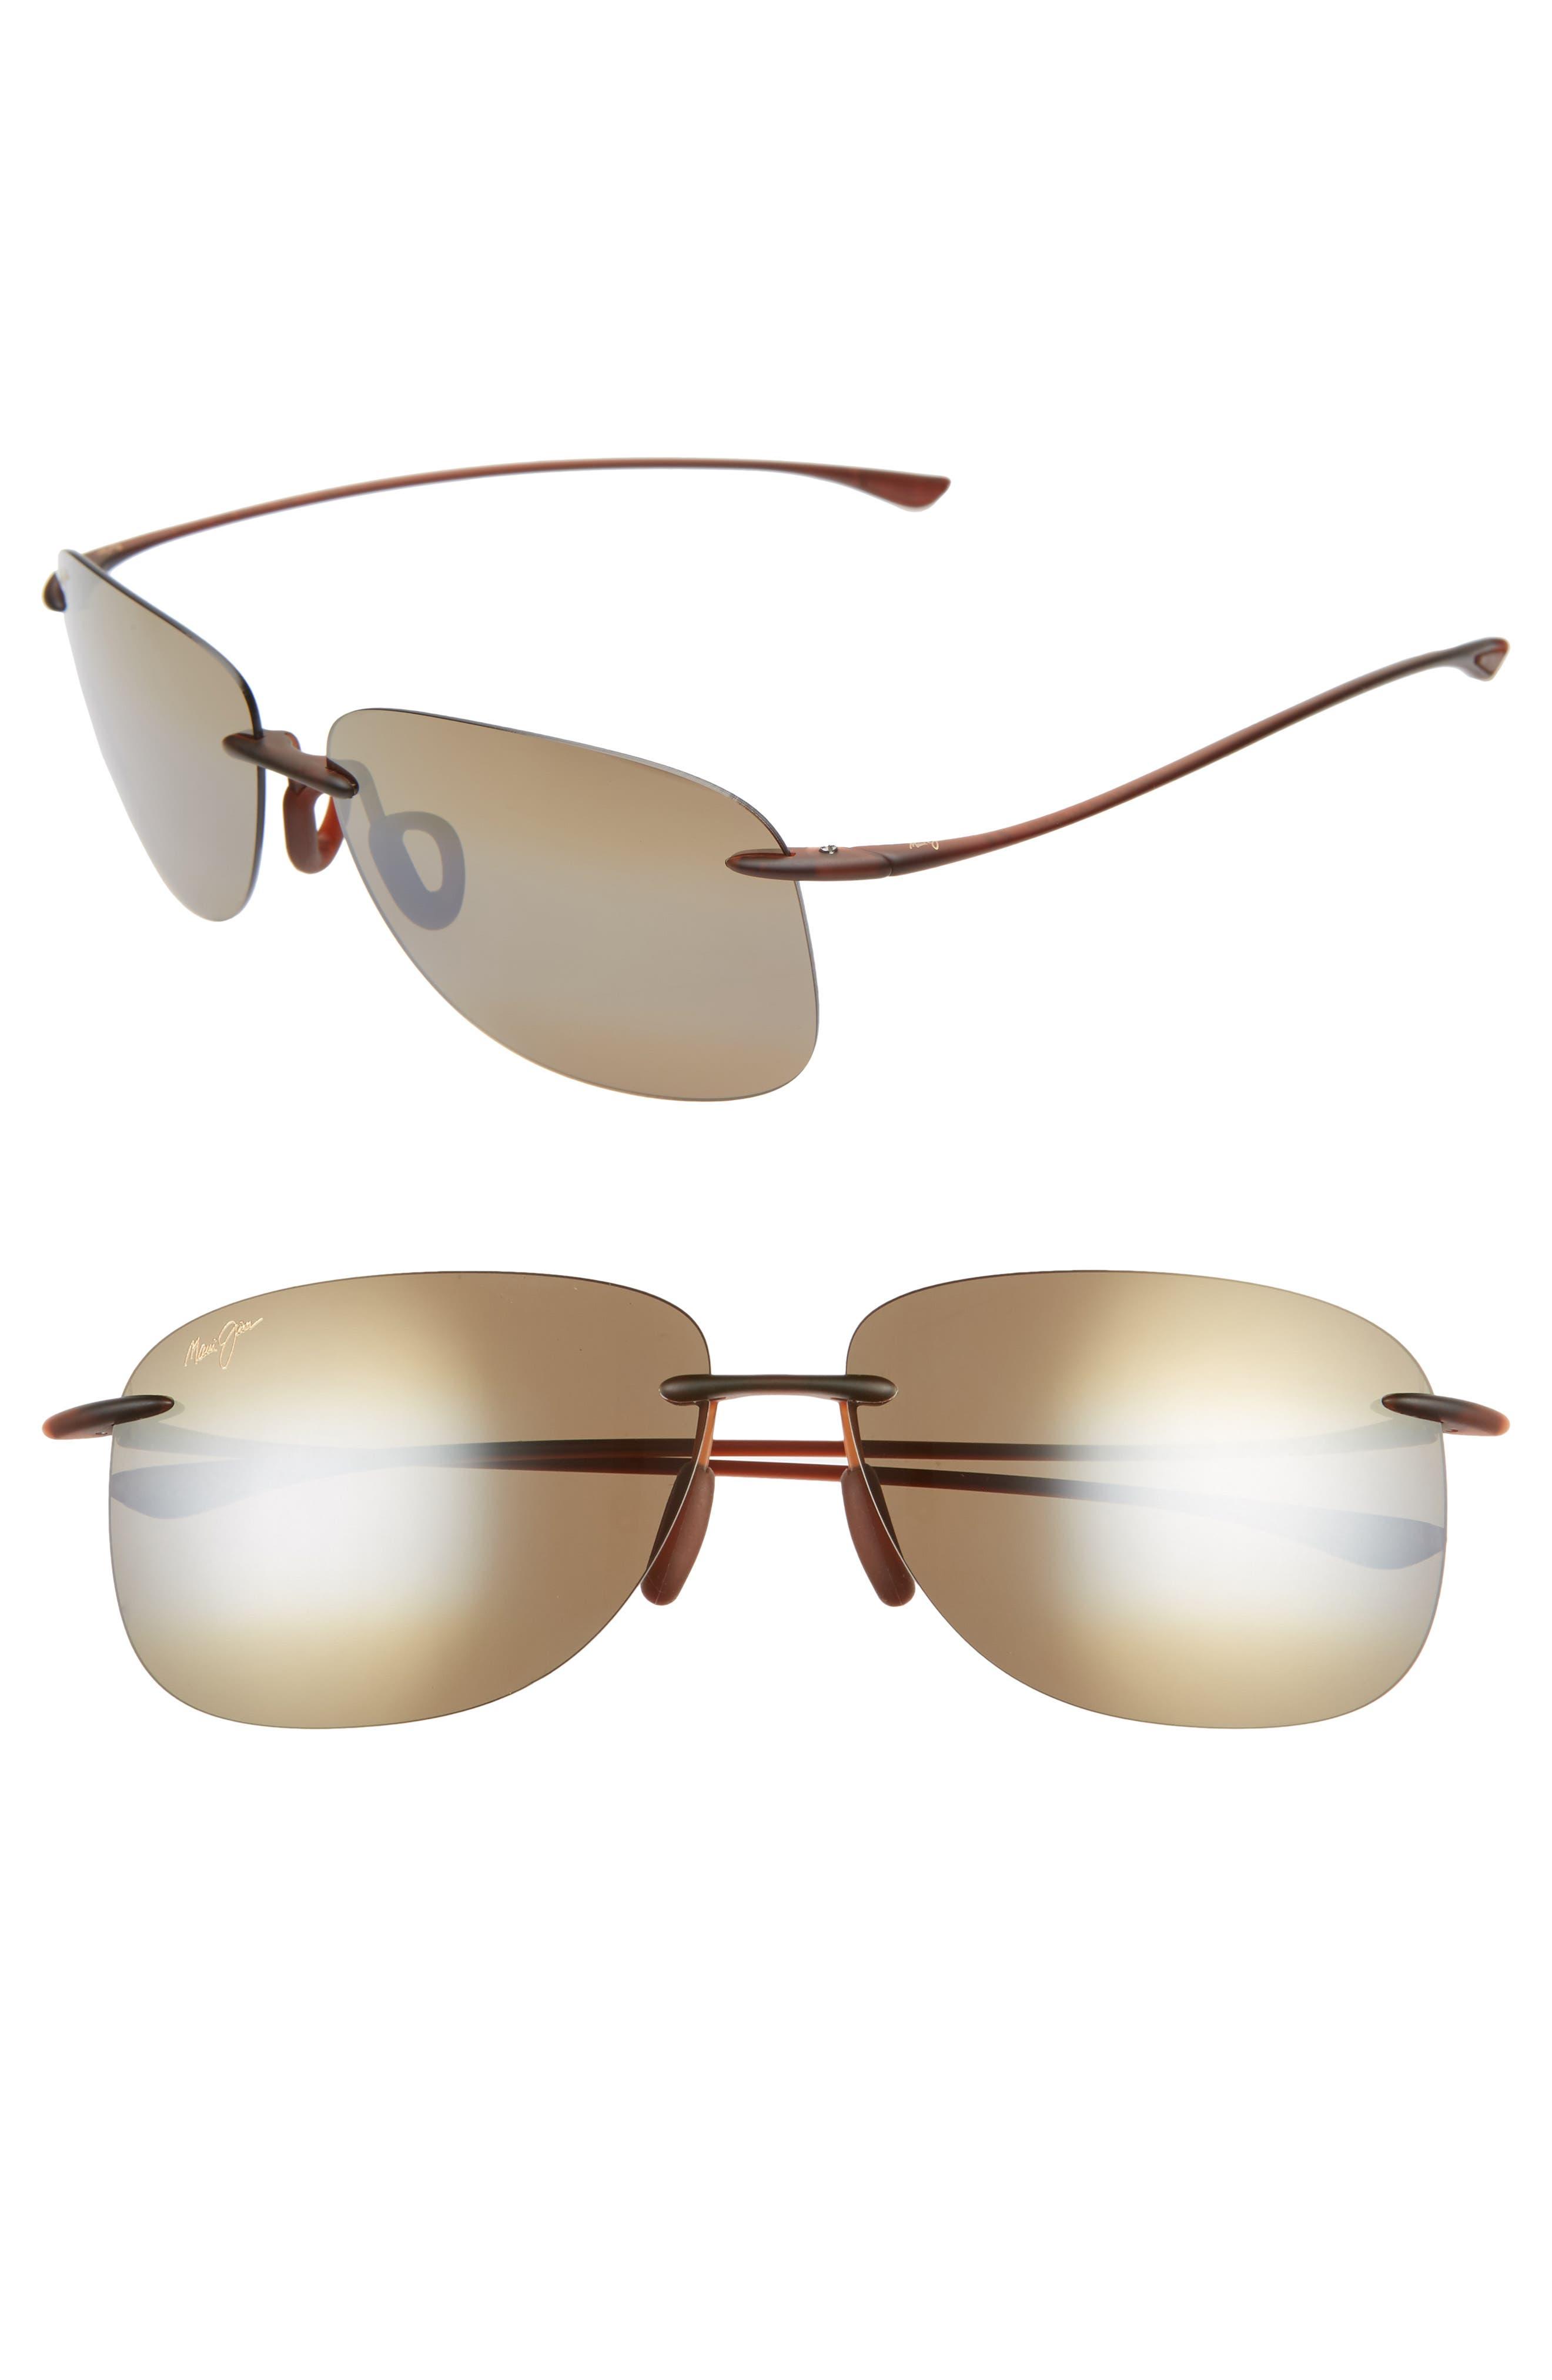 Hikina 62mm Polarizedplus2 Rimless Sunglasses